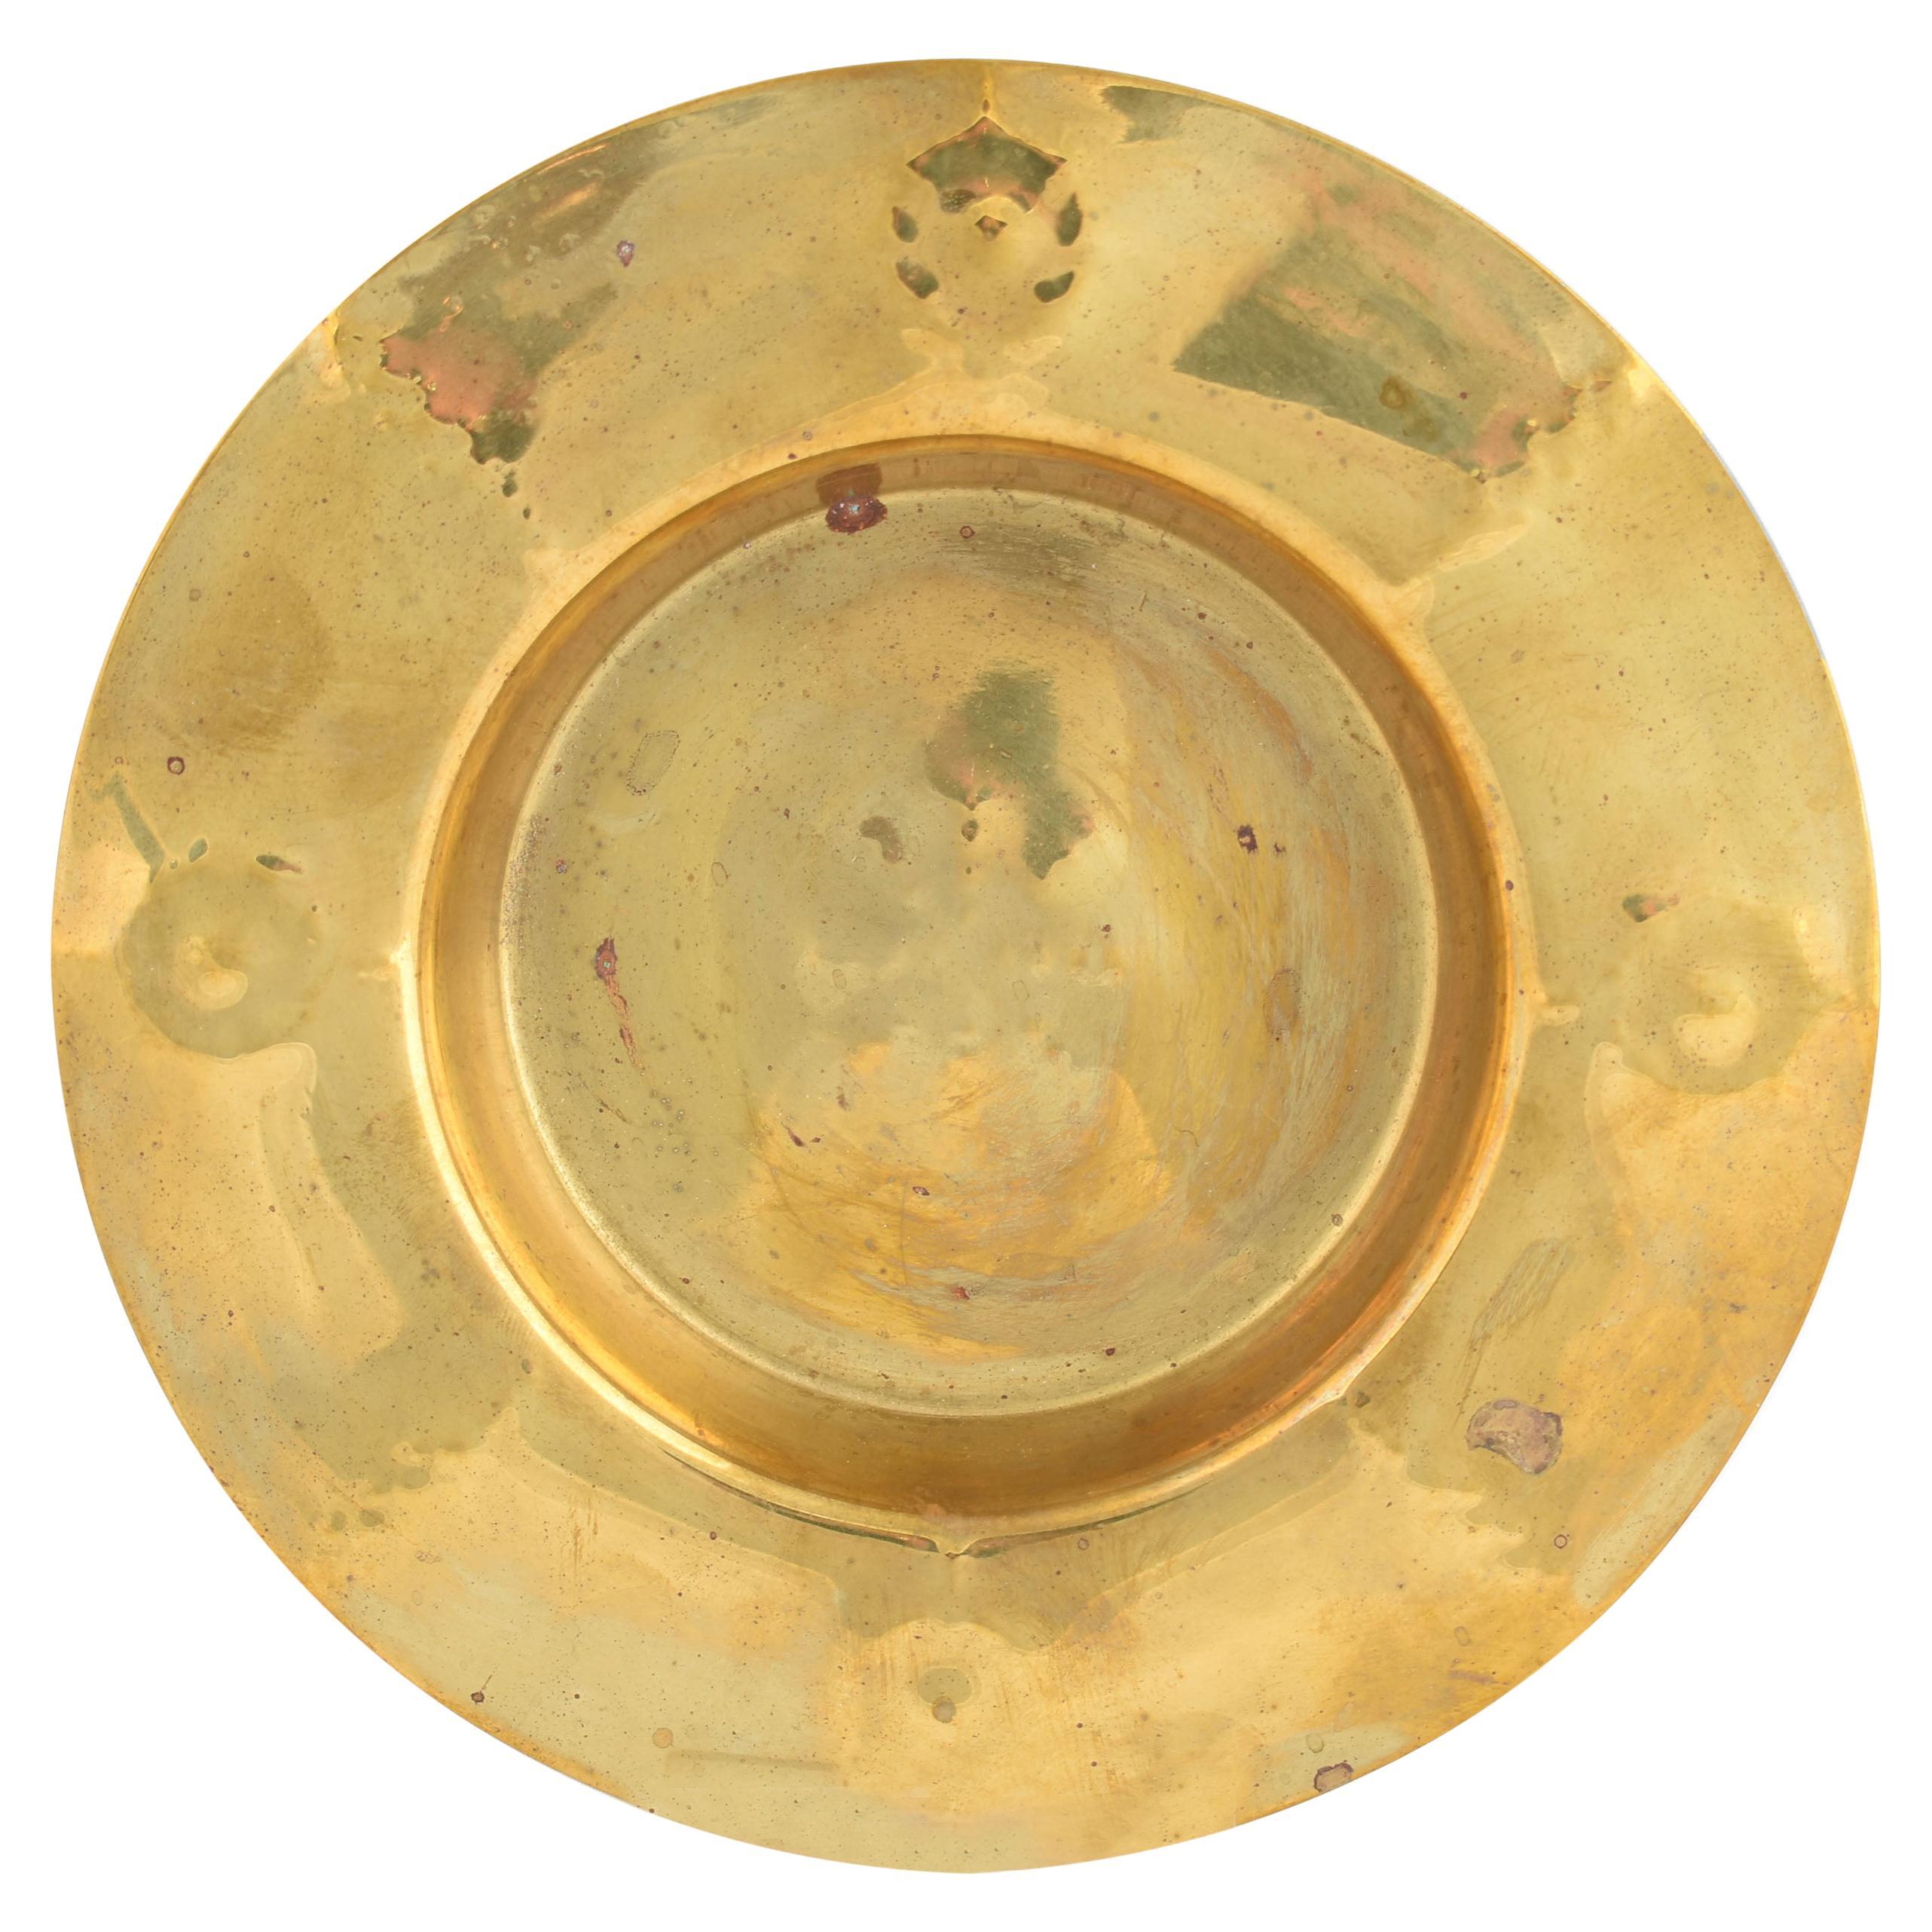 Vintage Art Deco Brass Plate by Albert Kahlbrandt, Germany, 1920s